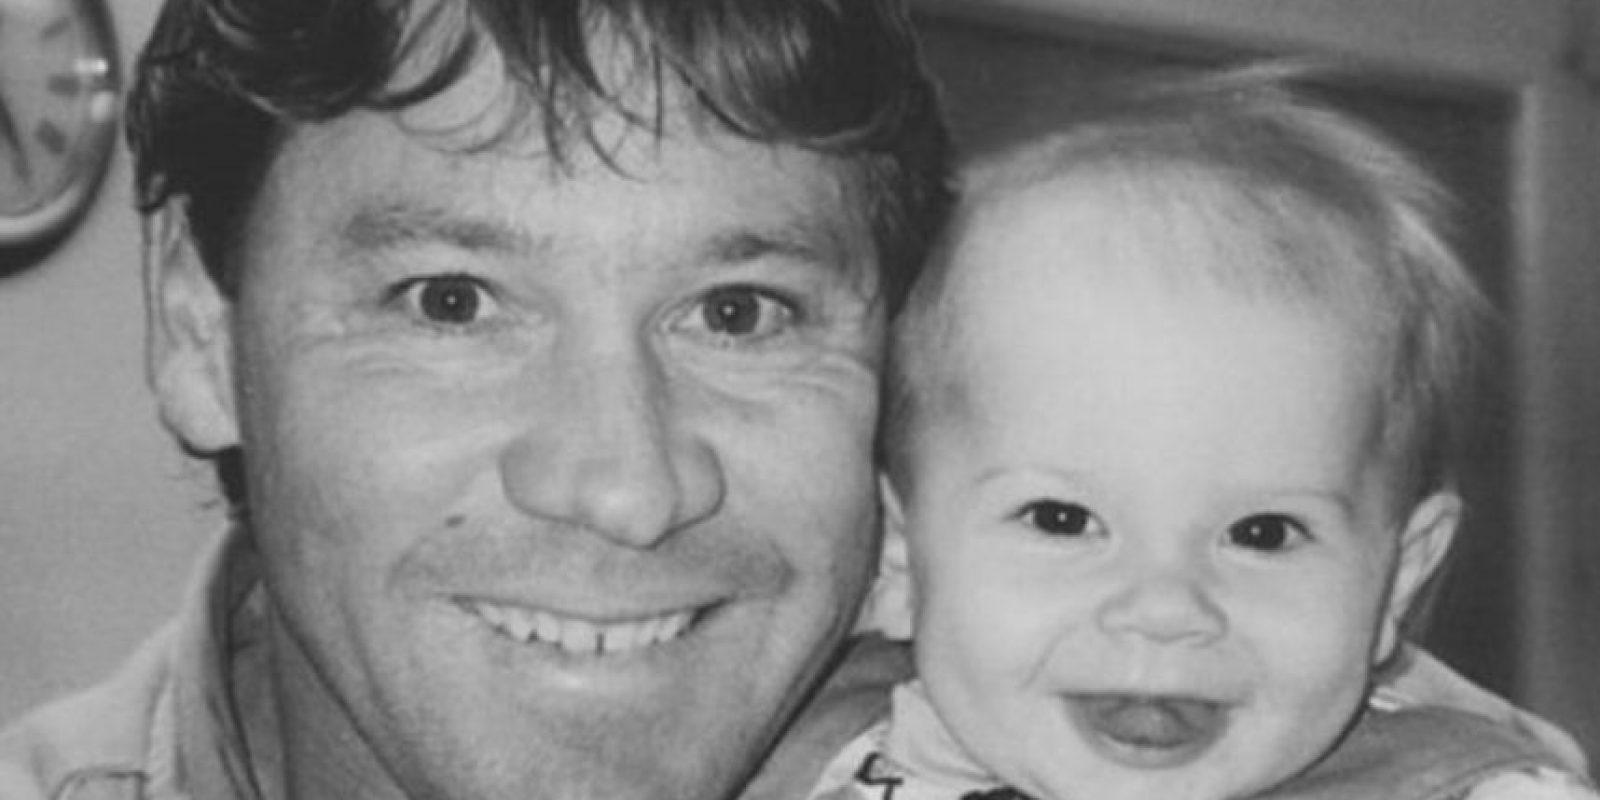 Bindi Irwin fue la primera hija del matrimonio de Steve y Terri Irwin. Foto:vía Instagram/bindisueirwin